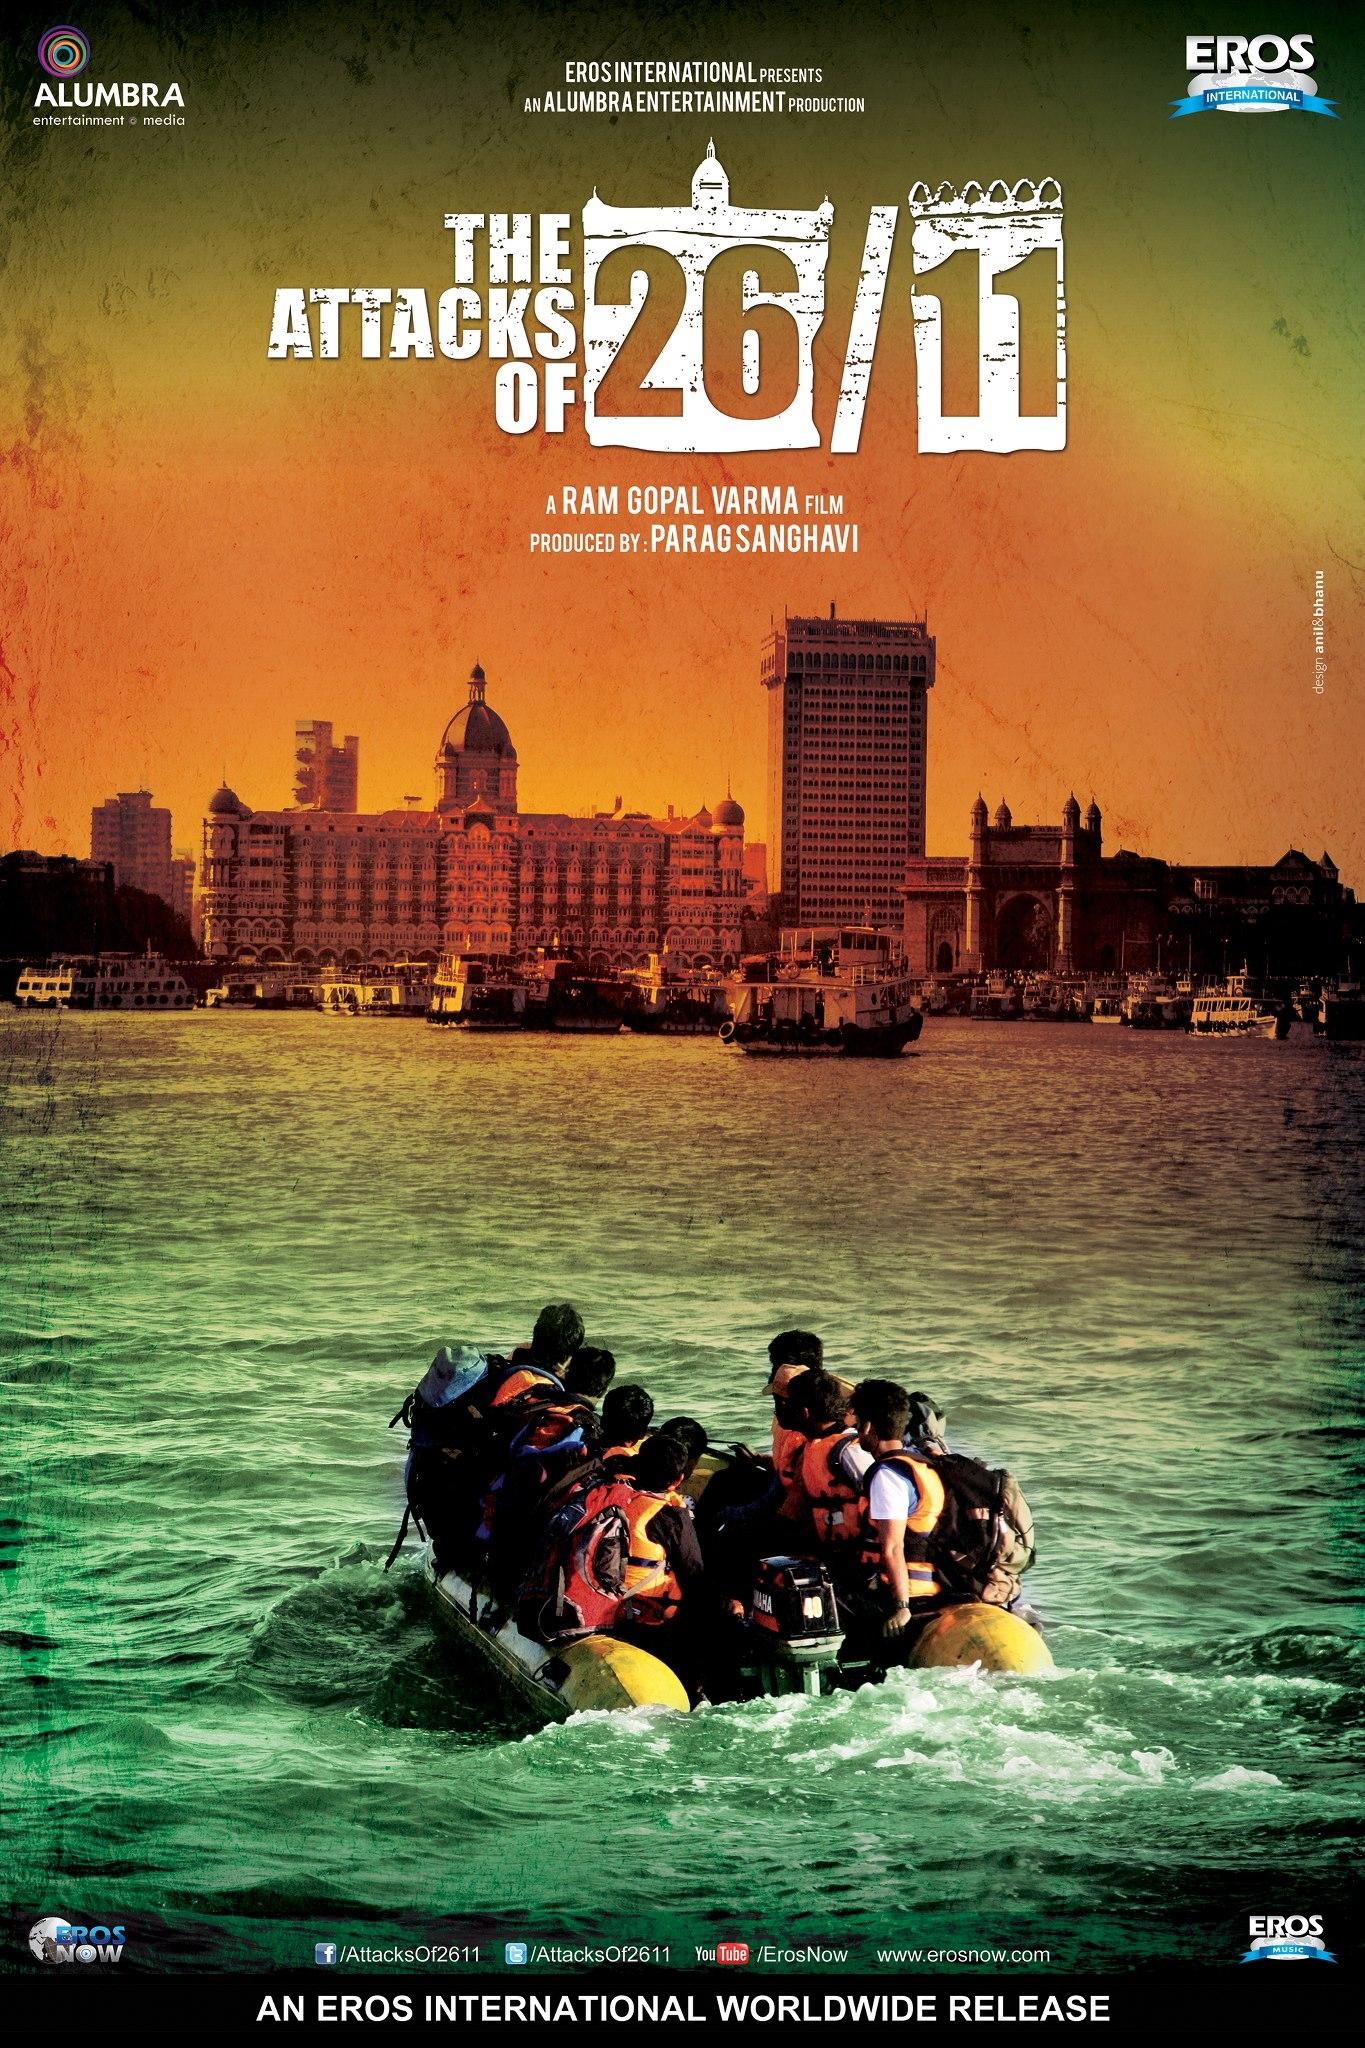 The Attacks Of 26/11 - Movie Poster #1 (Original)